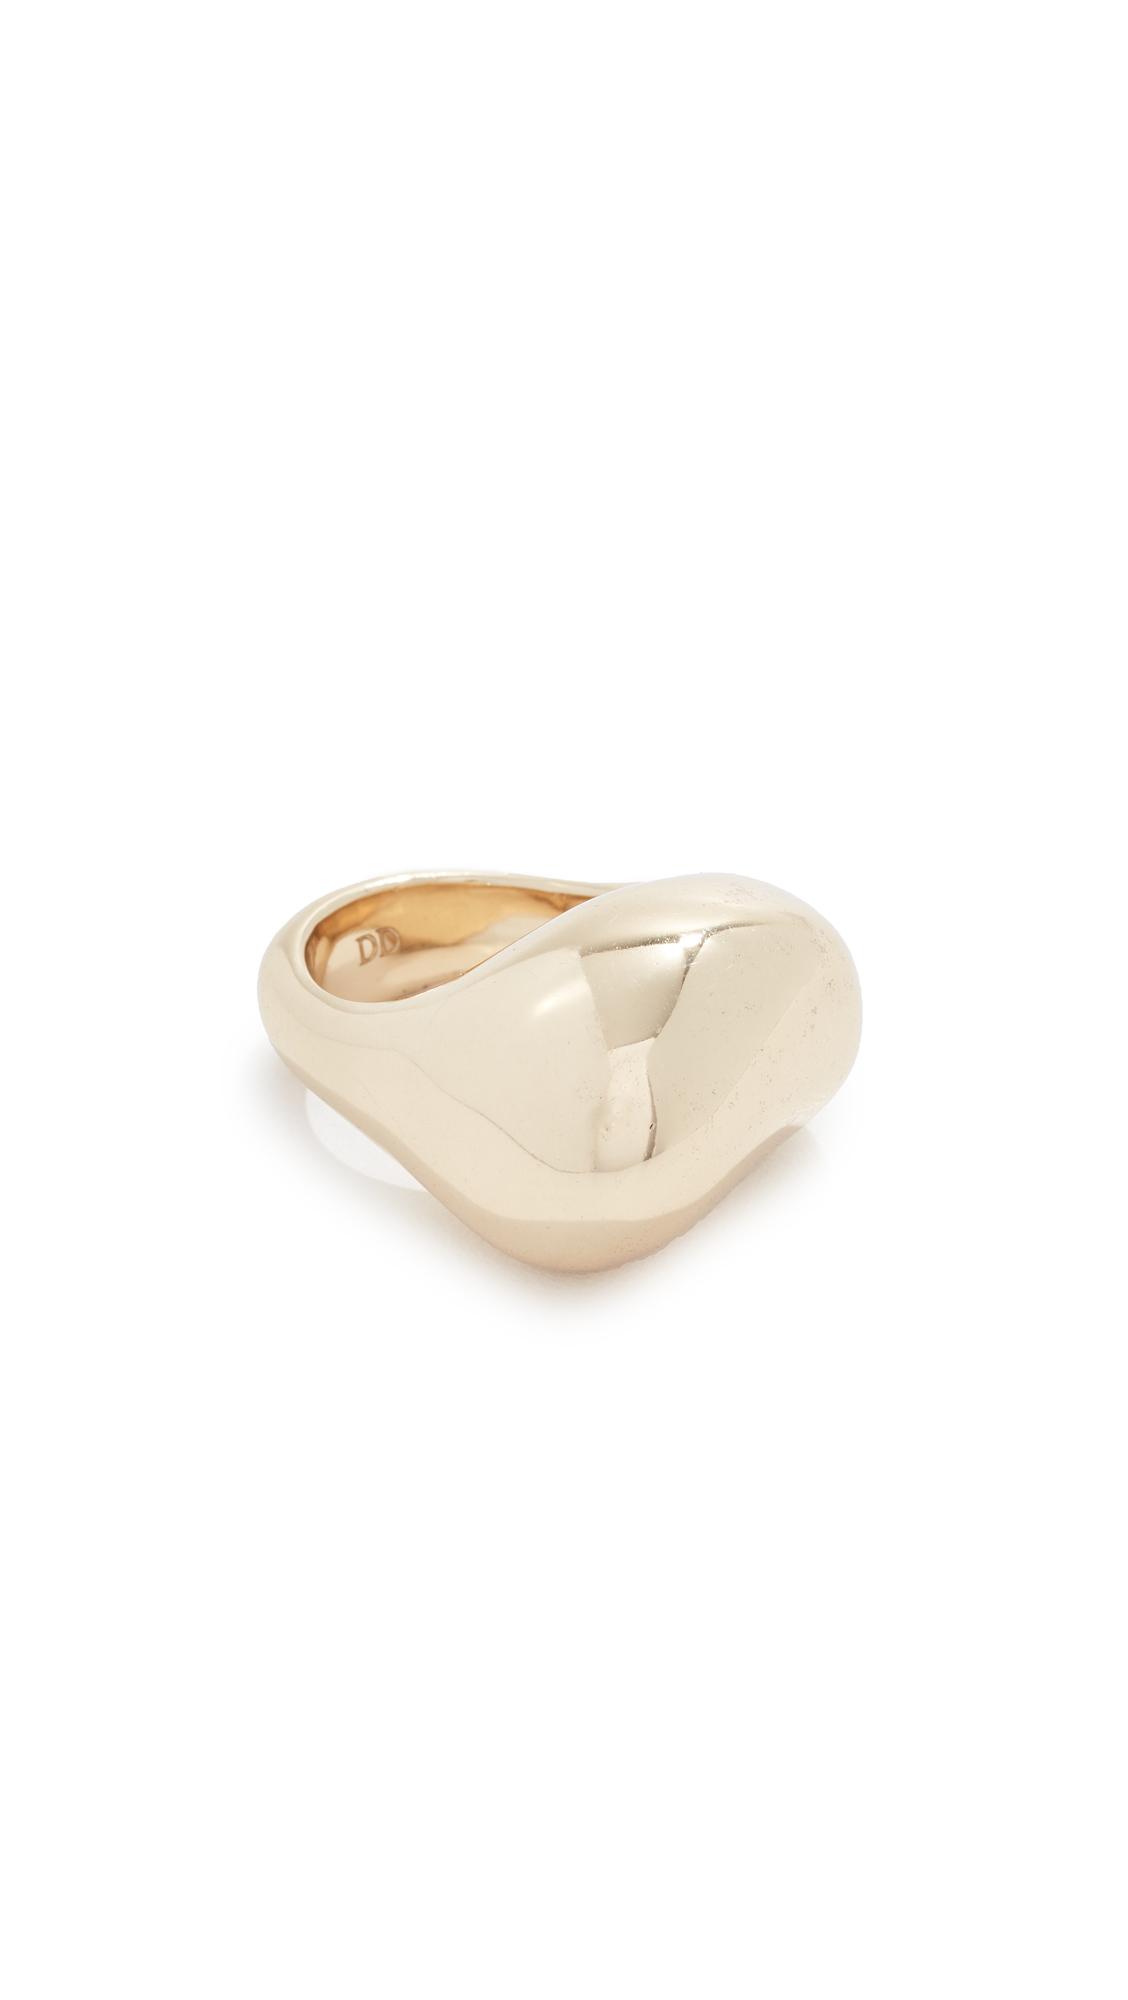 DINOSAUR DESIGNS Pebble Ring in Brass